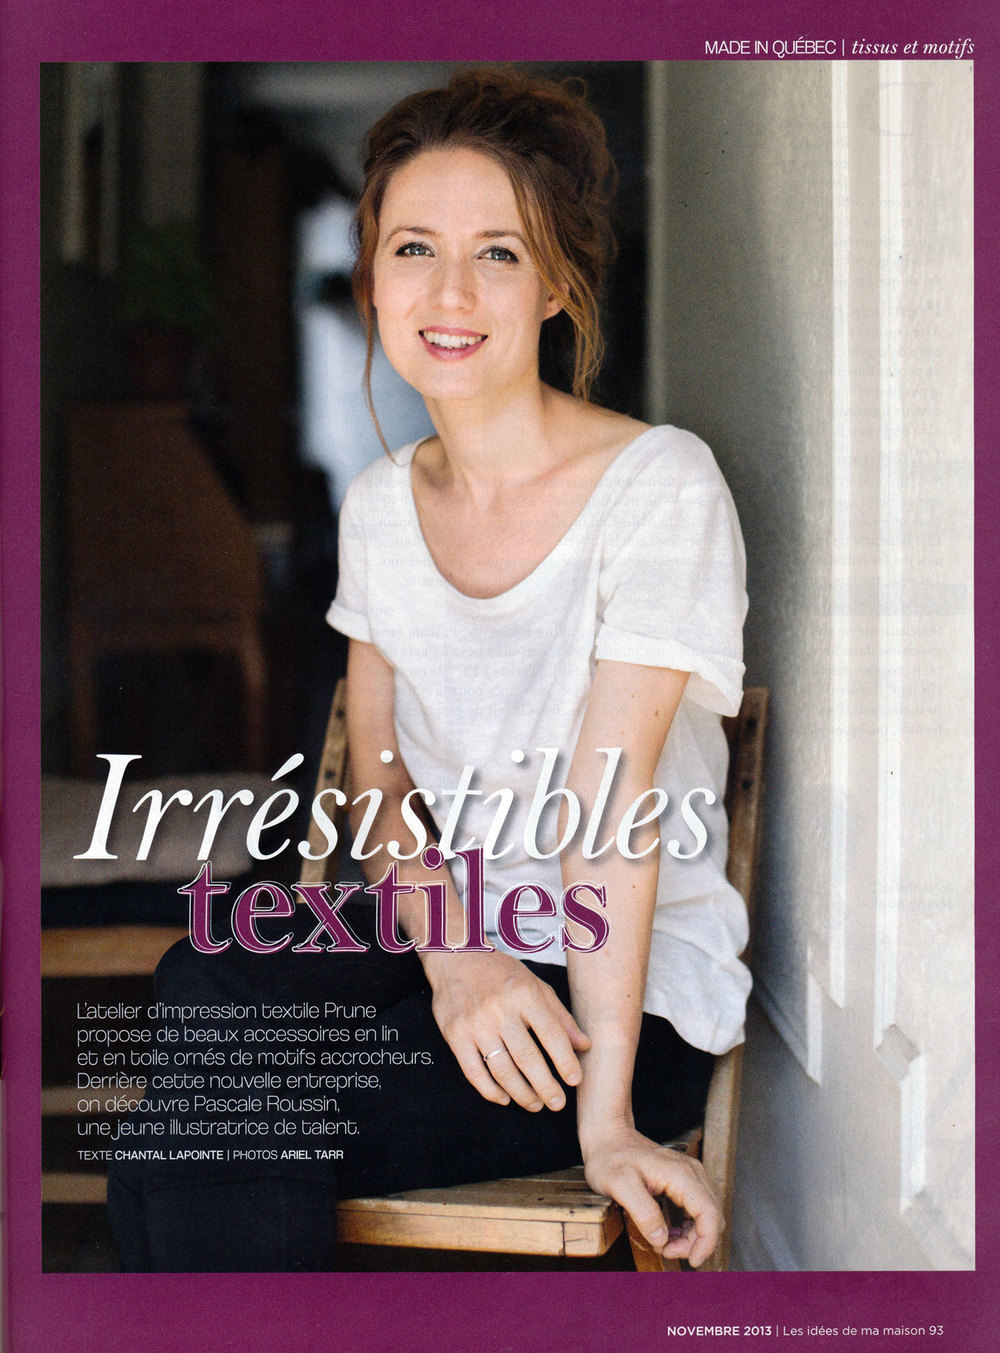 prune_textile_impression_Article_Idees_de_ma_maison_1.jpg